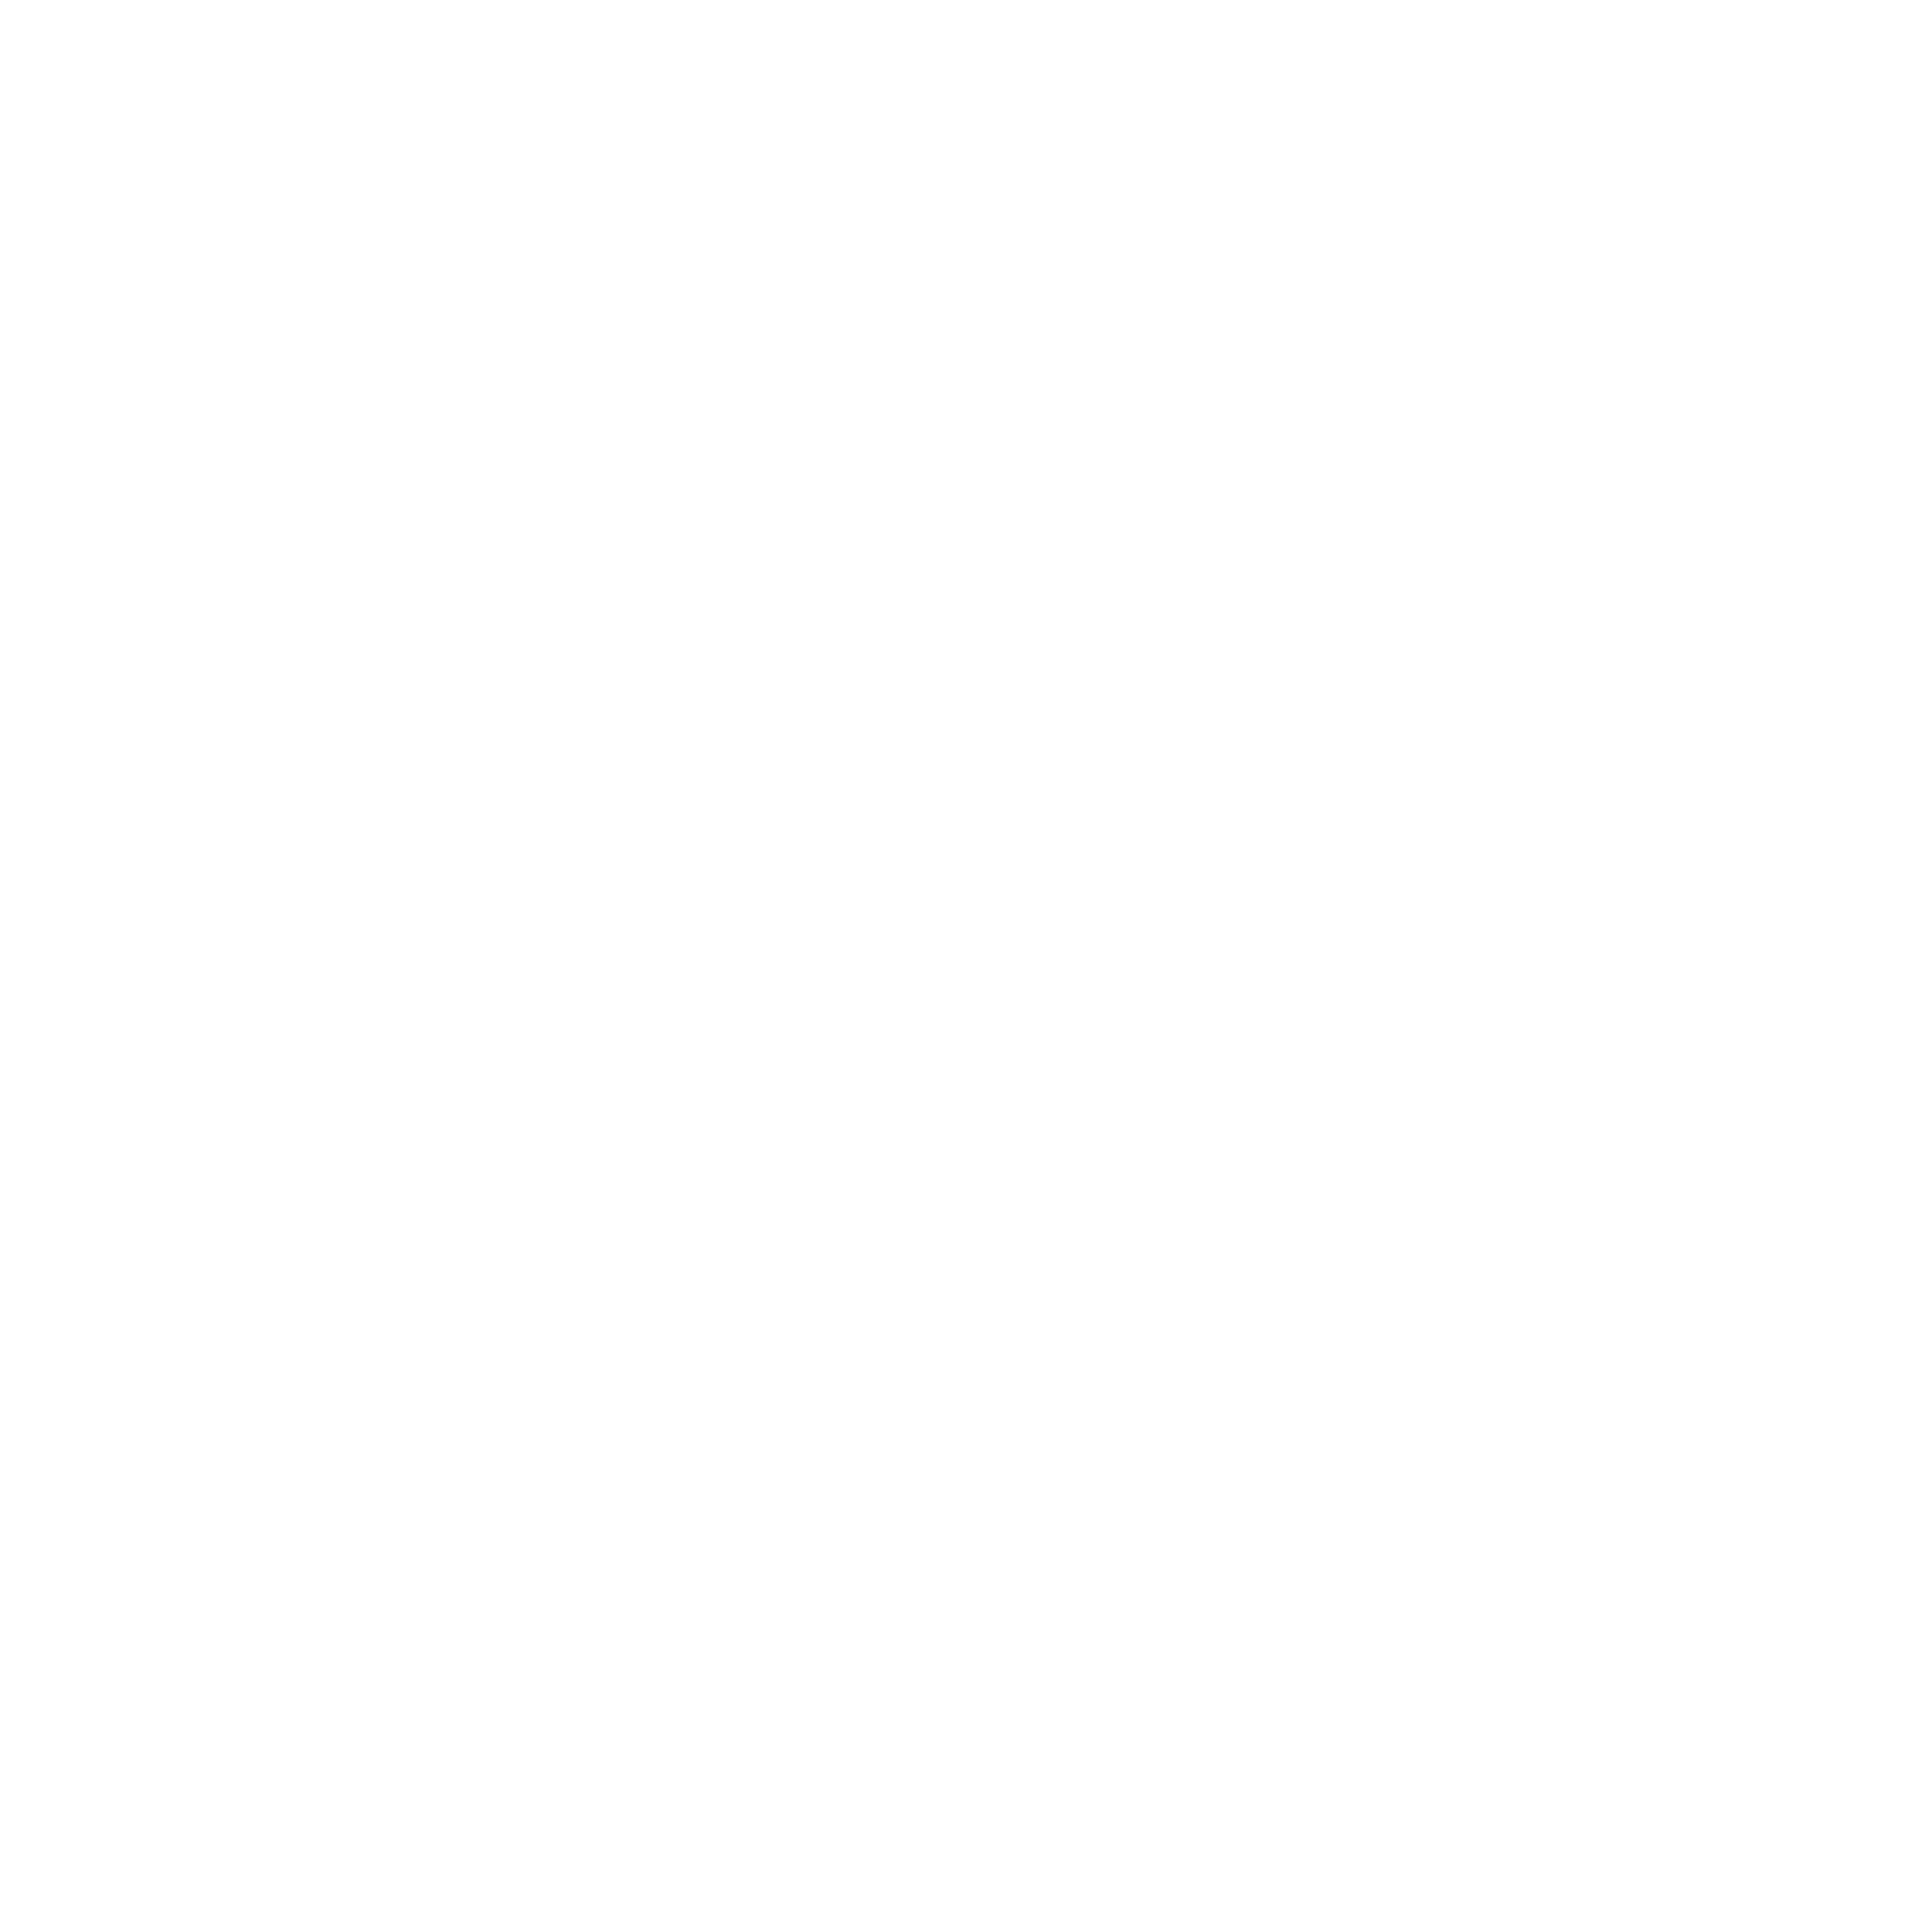 GE-01.png